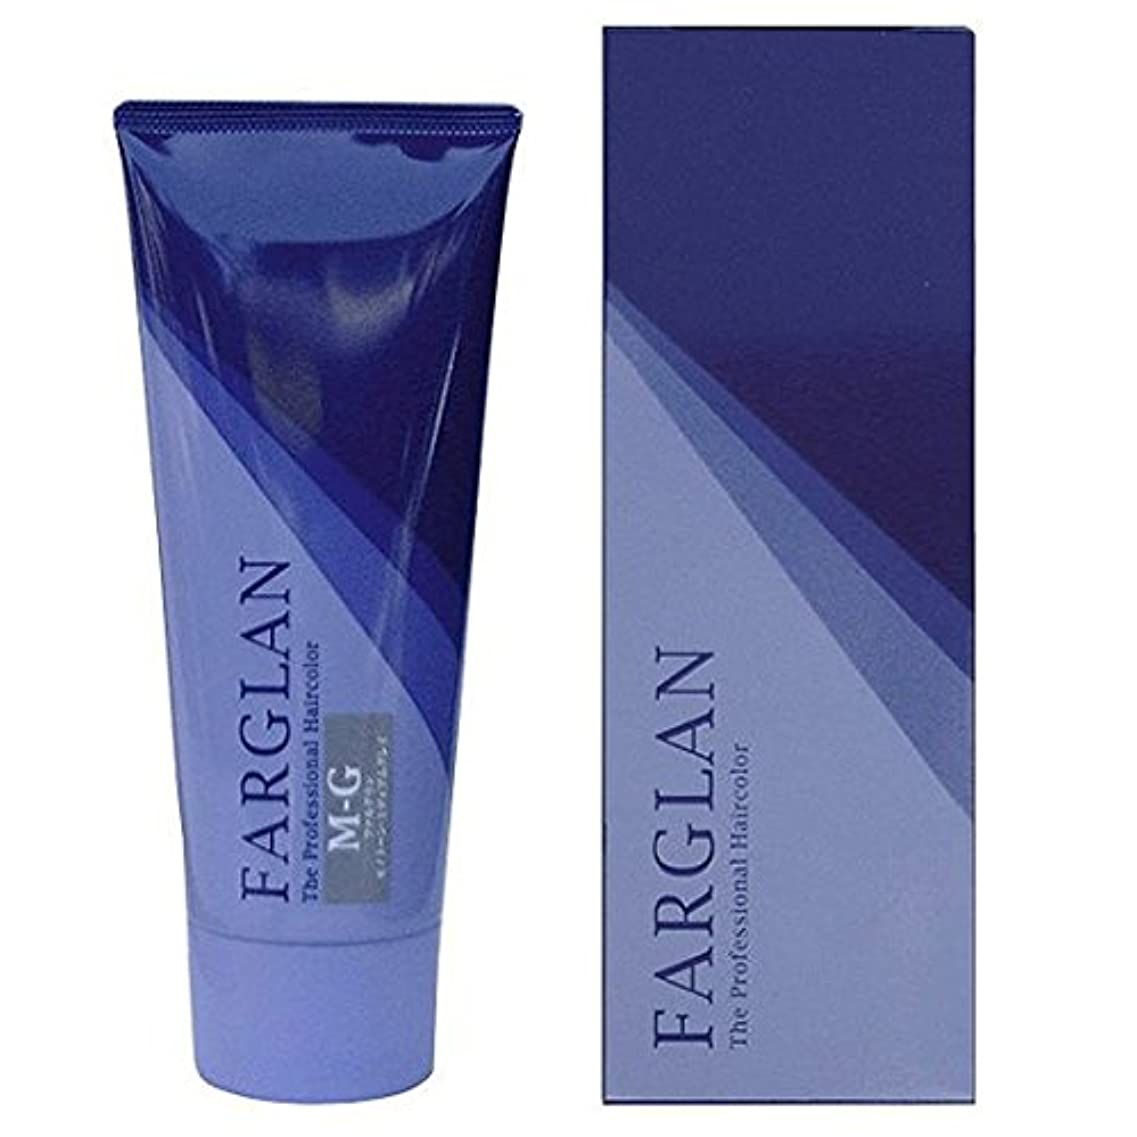 FARGLAN(ファルグラン) ヘアカラー OR(ORANGE) 160g